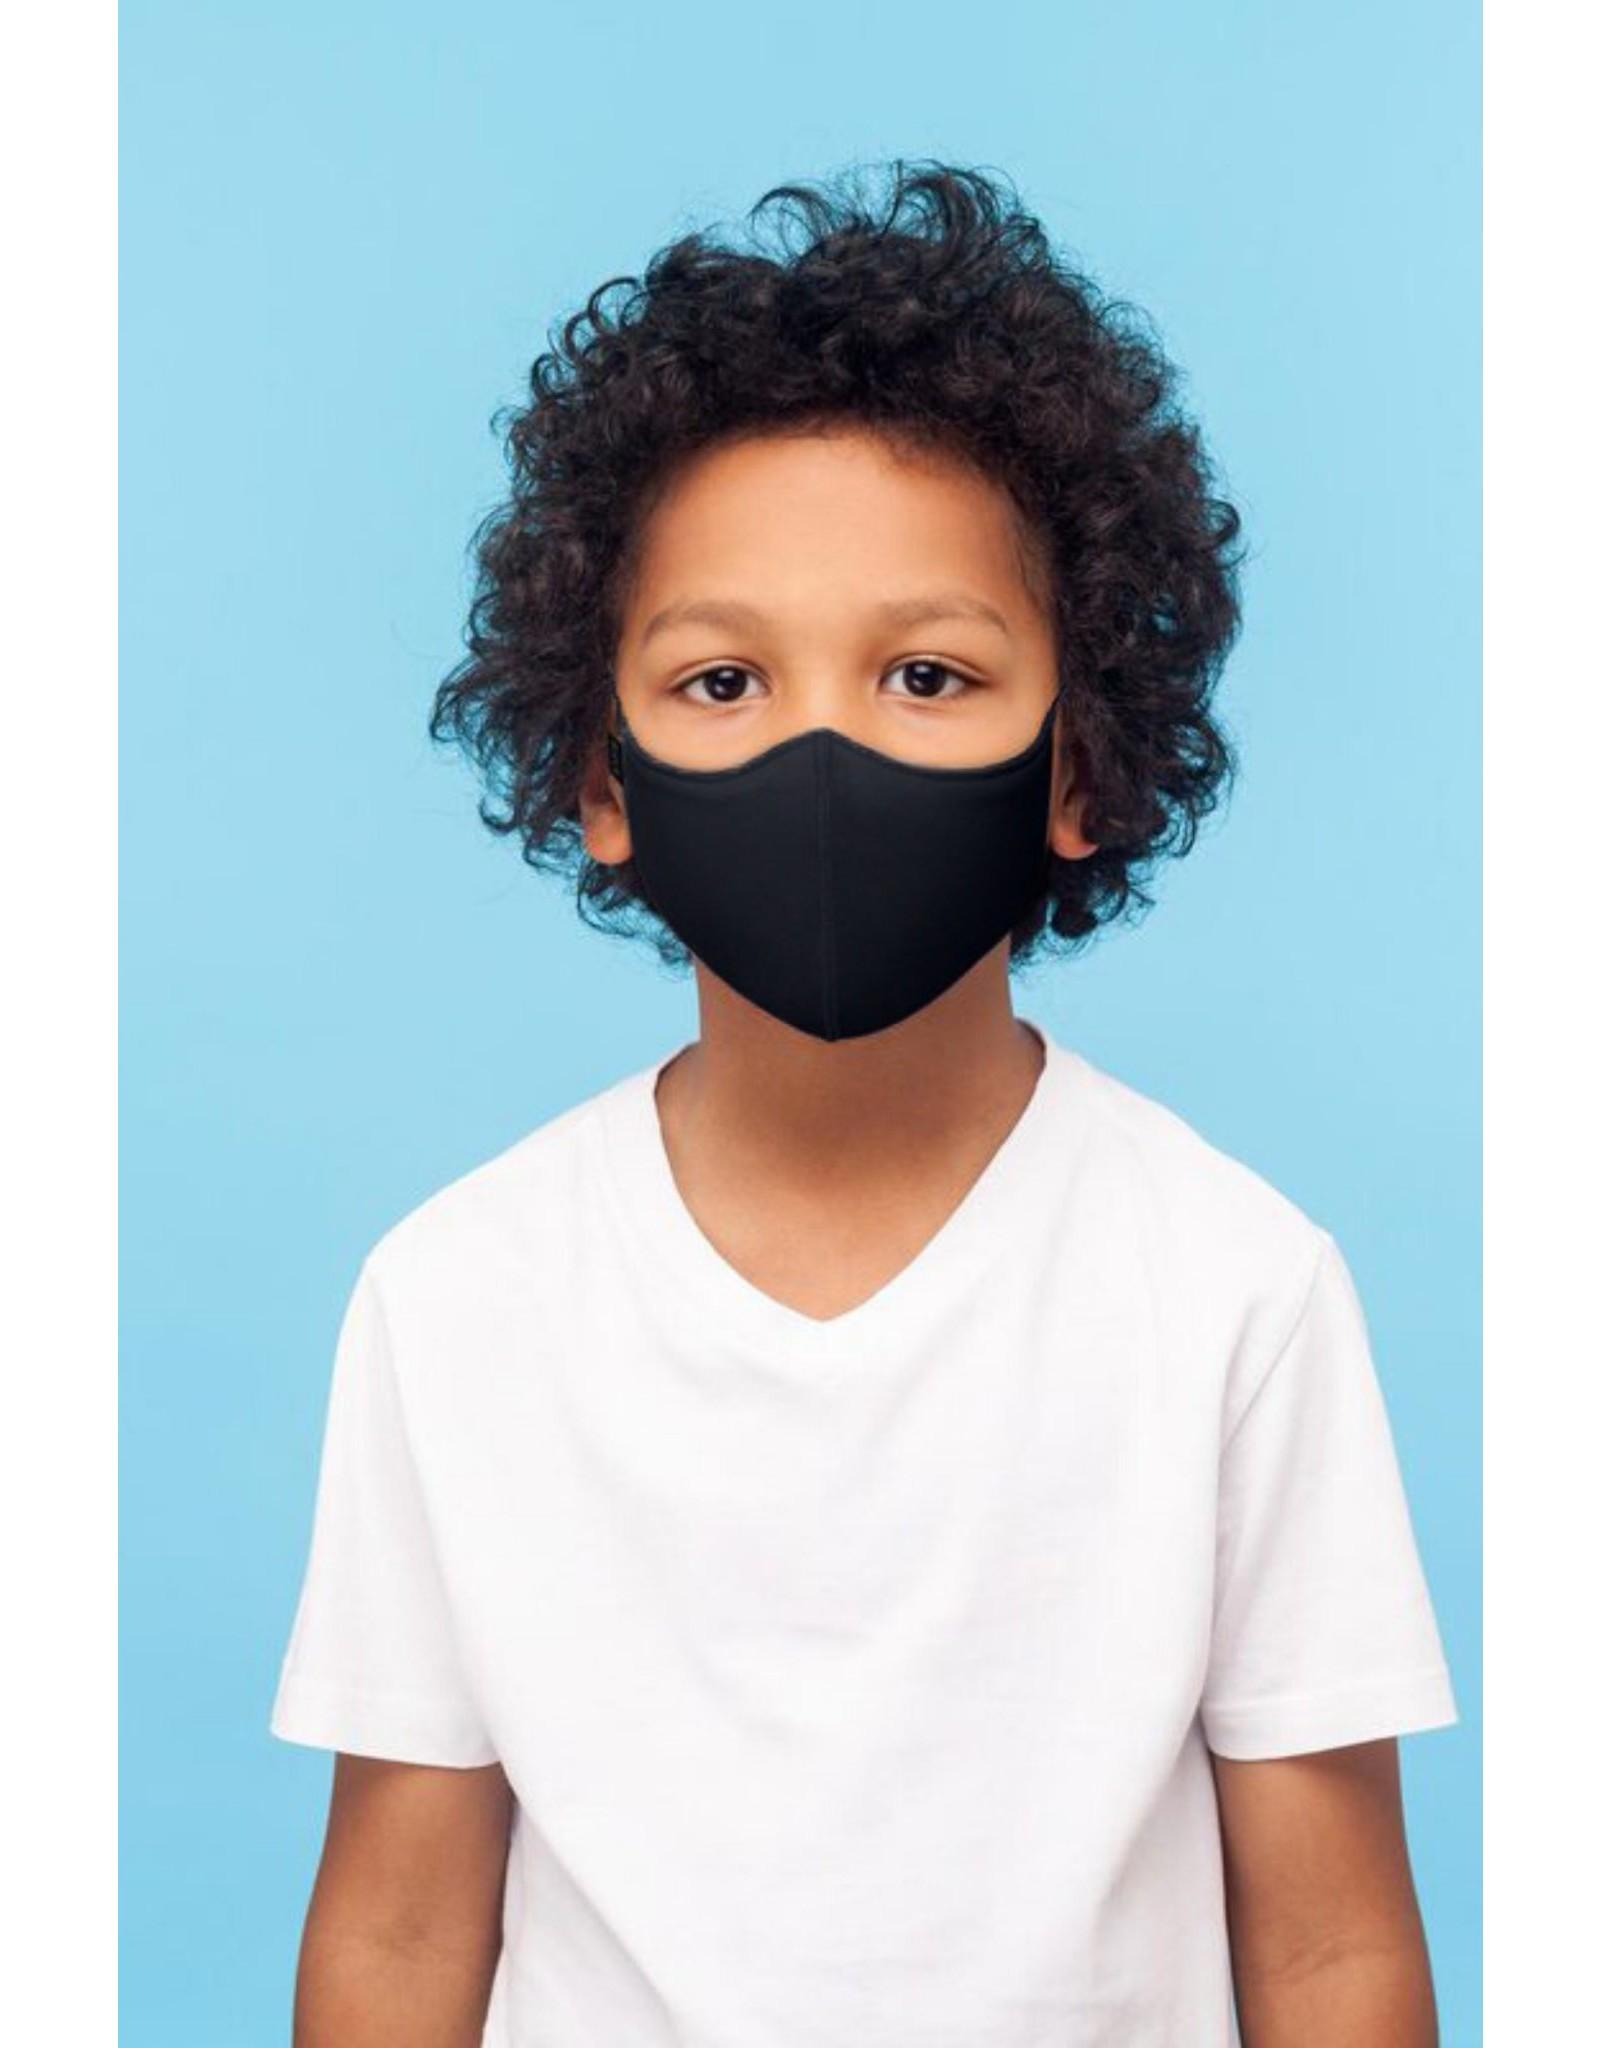 Bloch B-Safe Children's Stretch Mask - Black